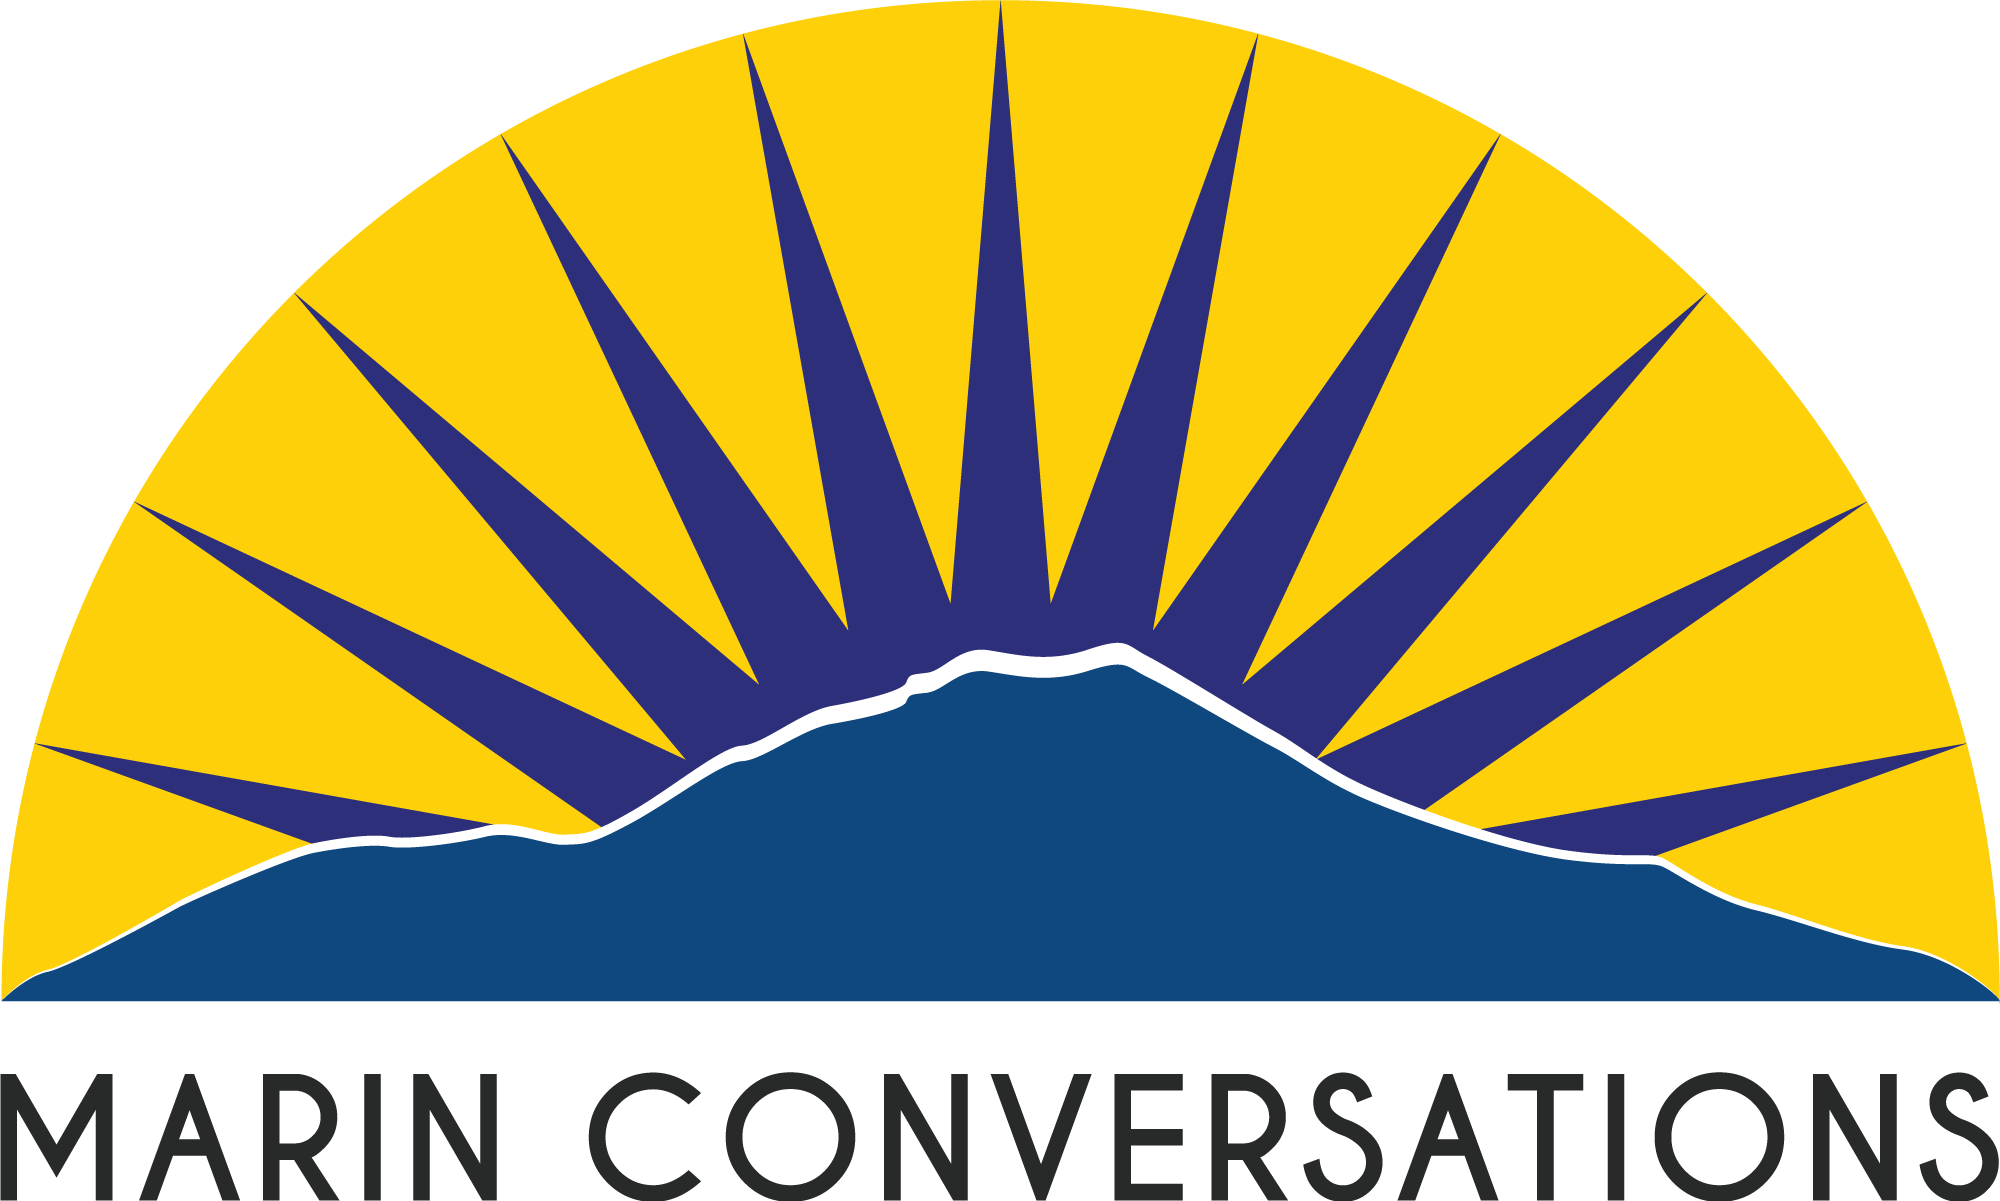 Marin Conversations